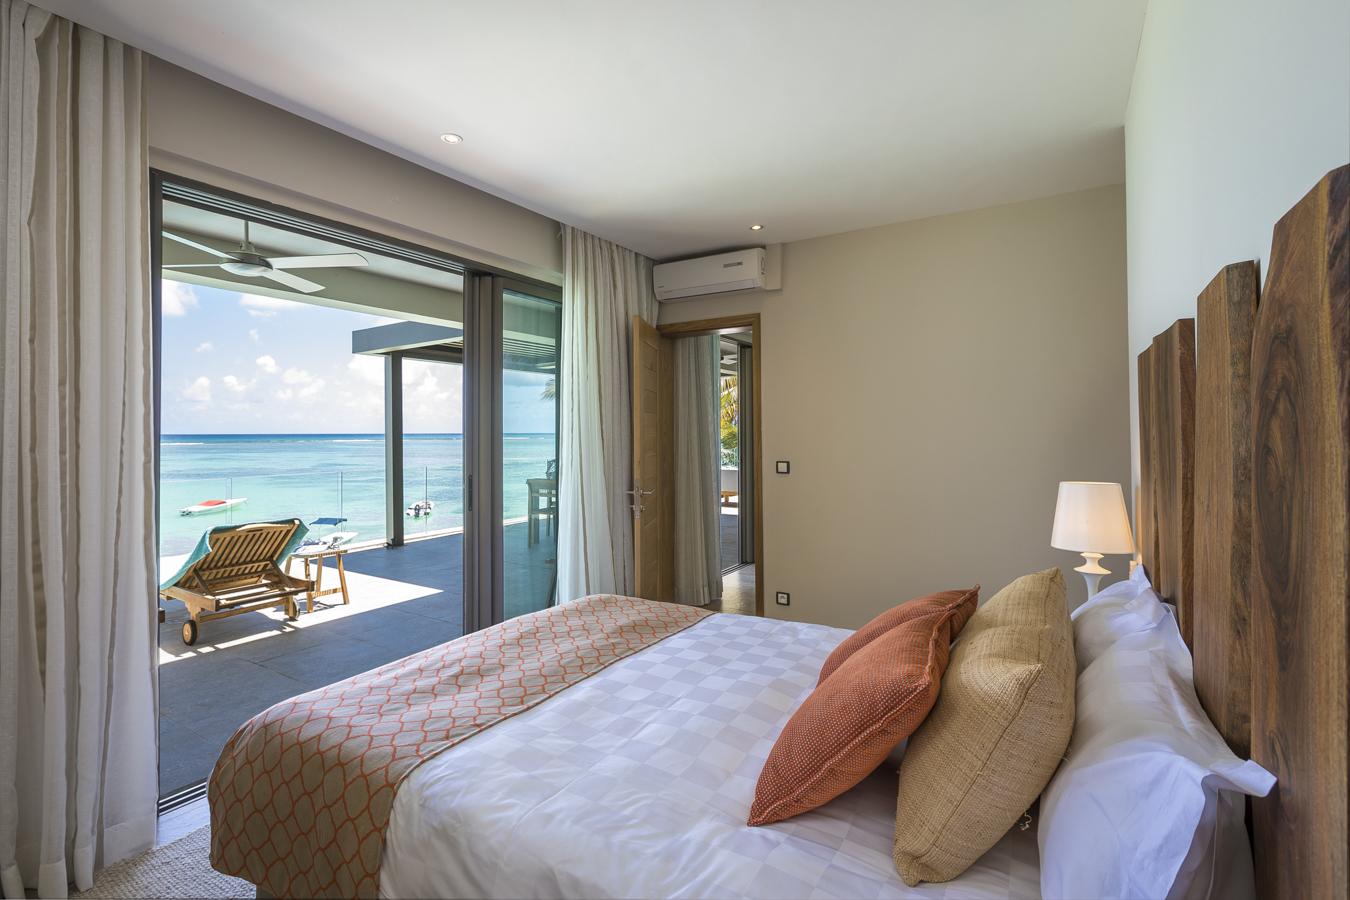 KotNor bedroom with sea view1